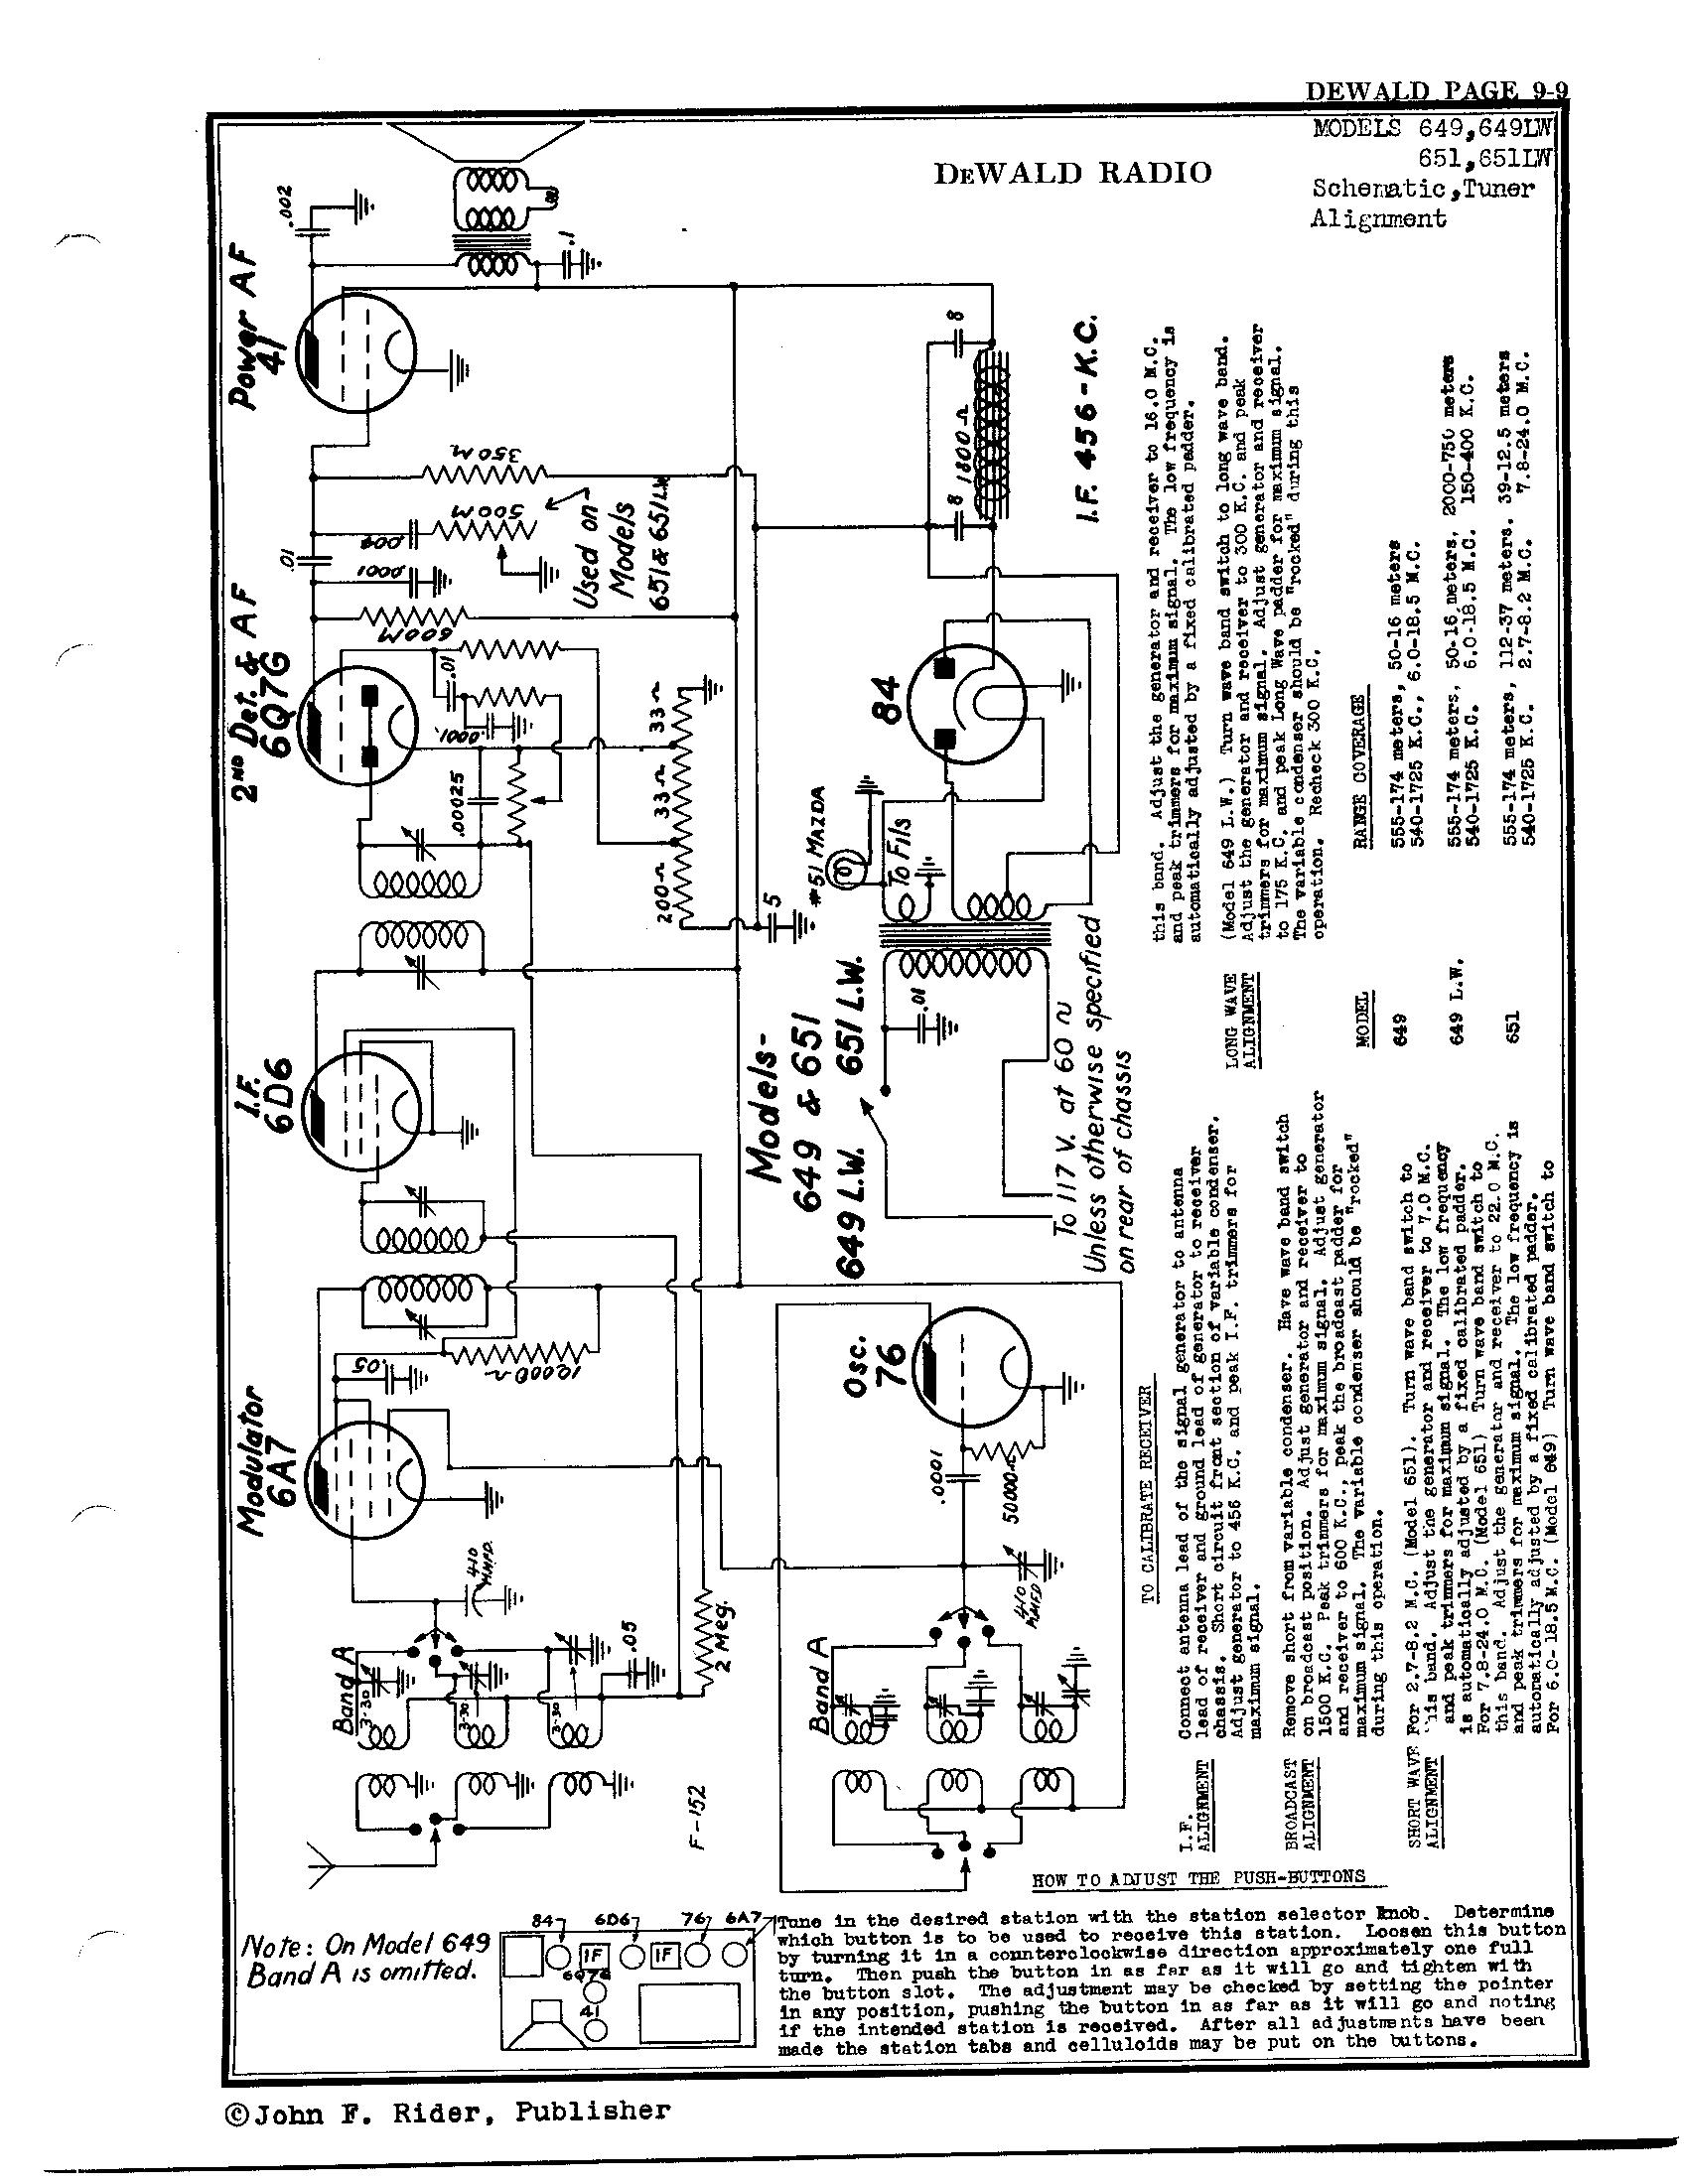 dewald radio mfg  corp  651